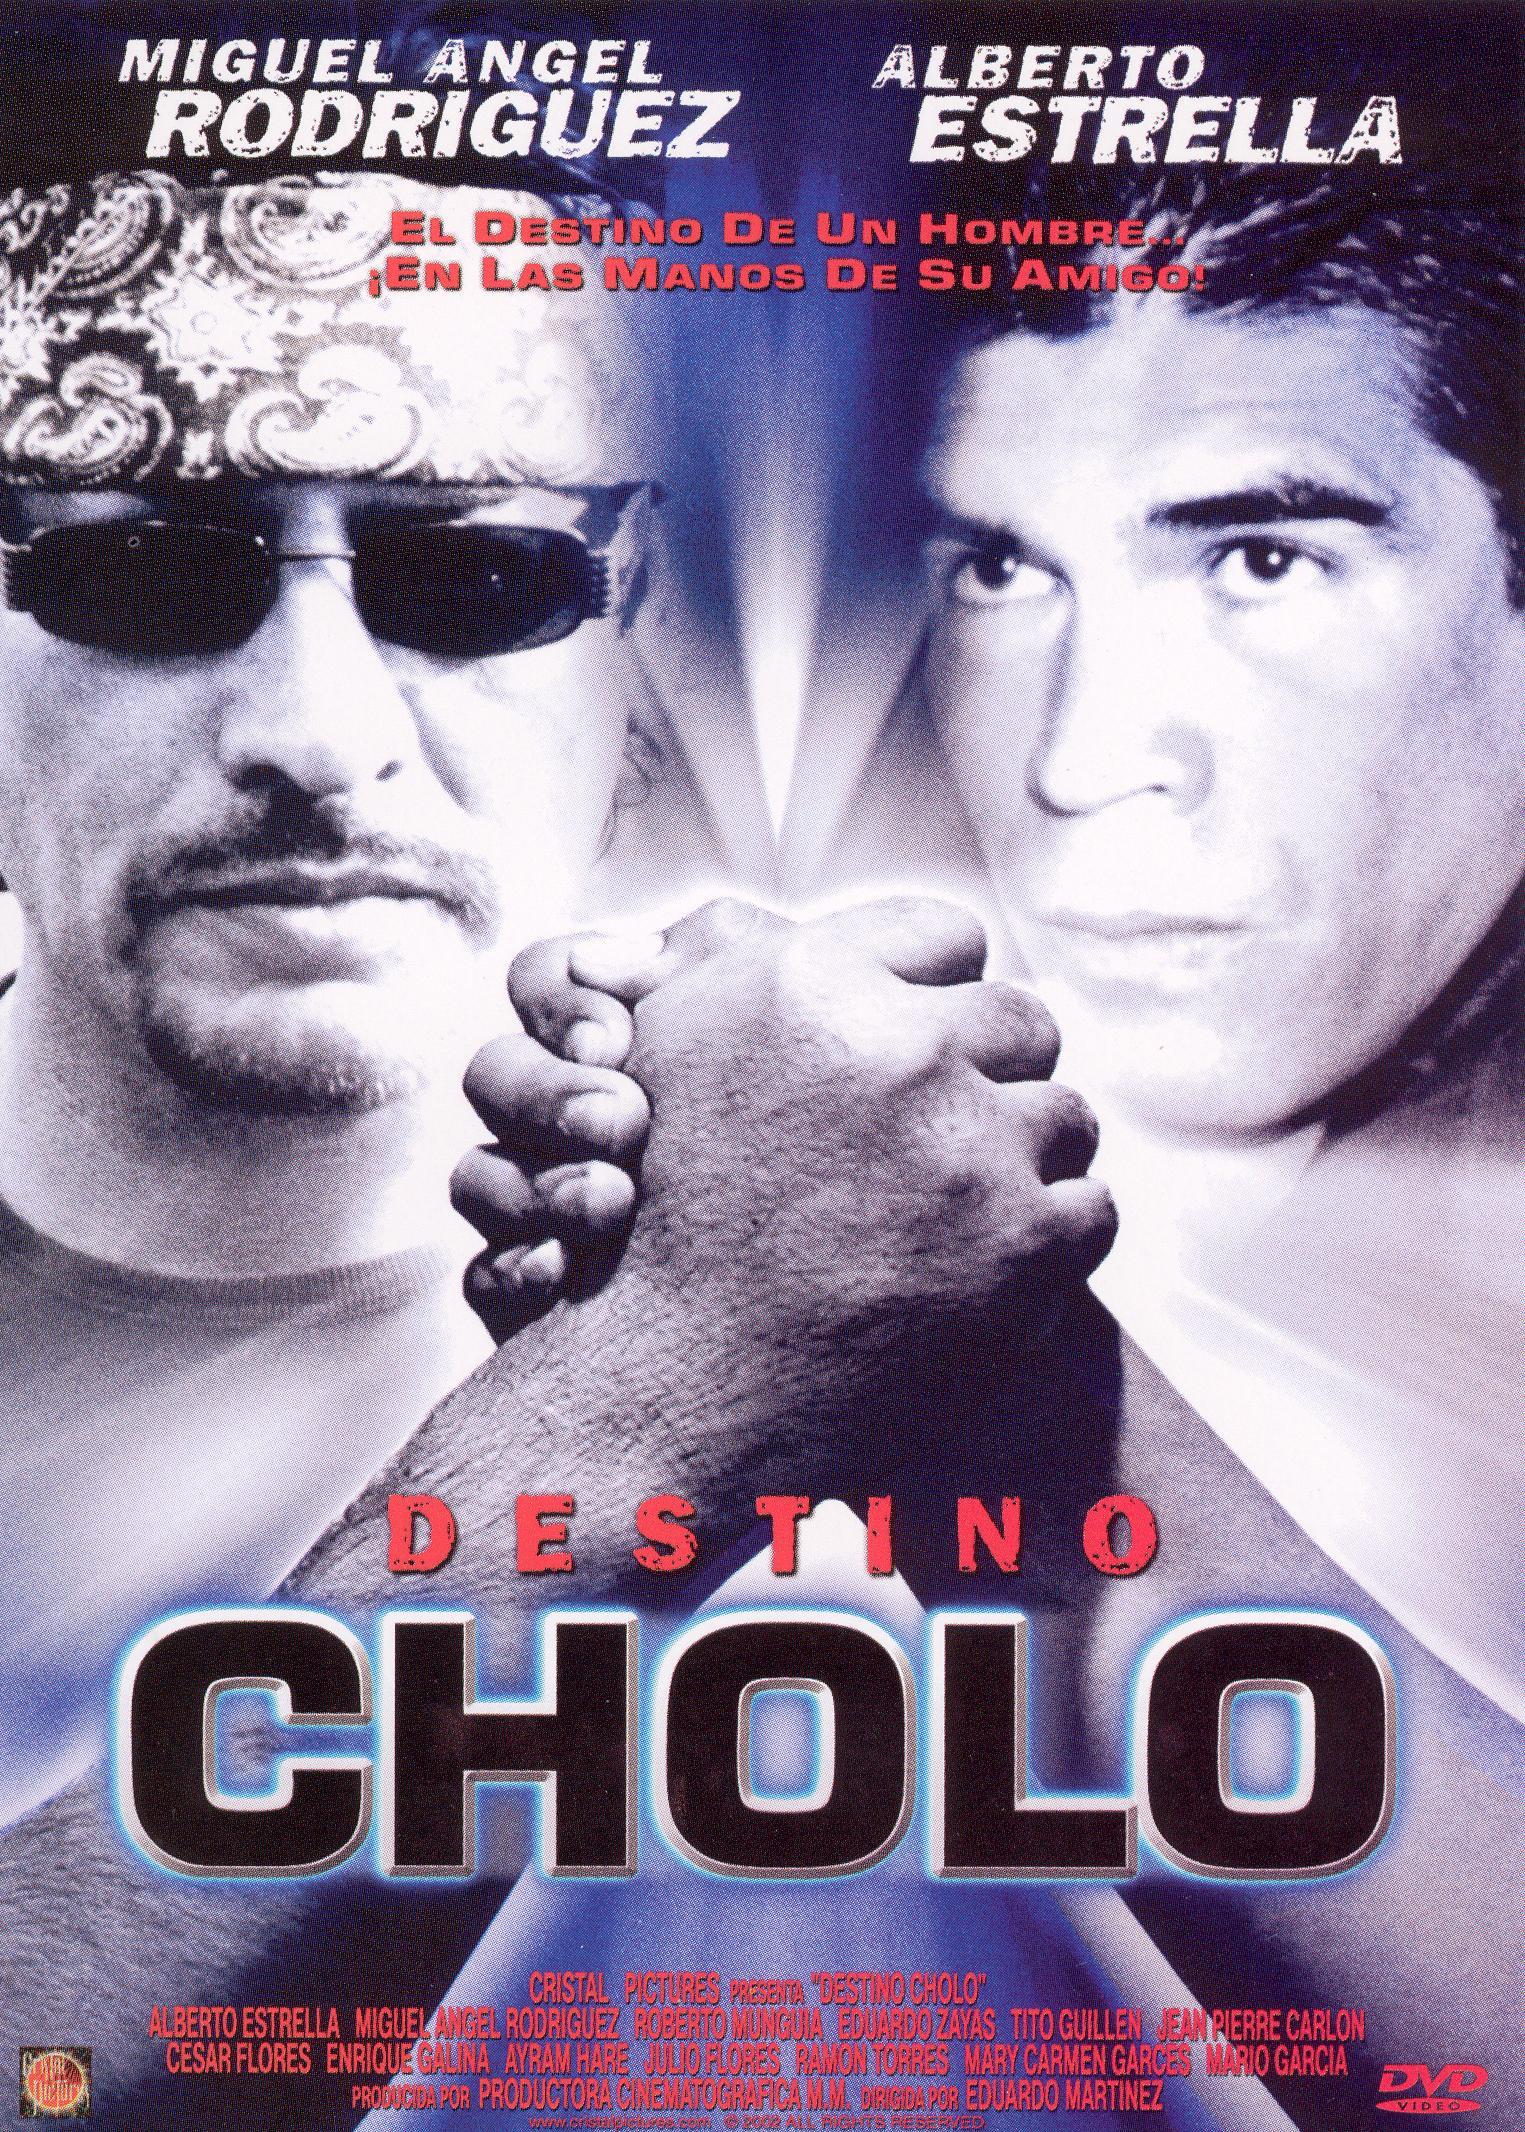 Destino Cholo